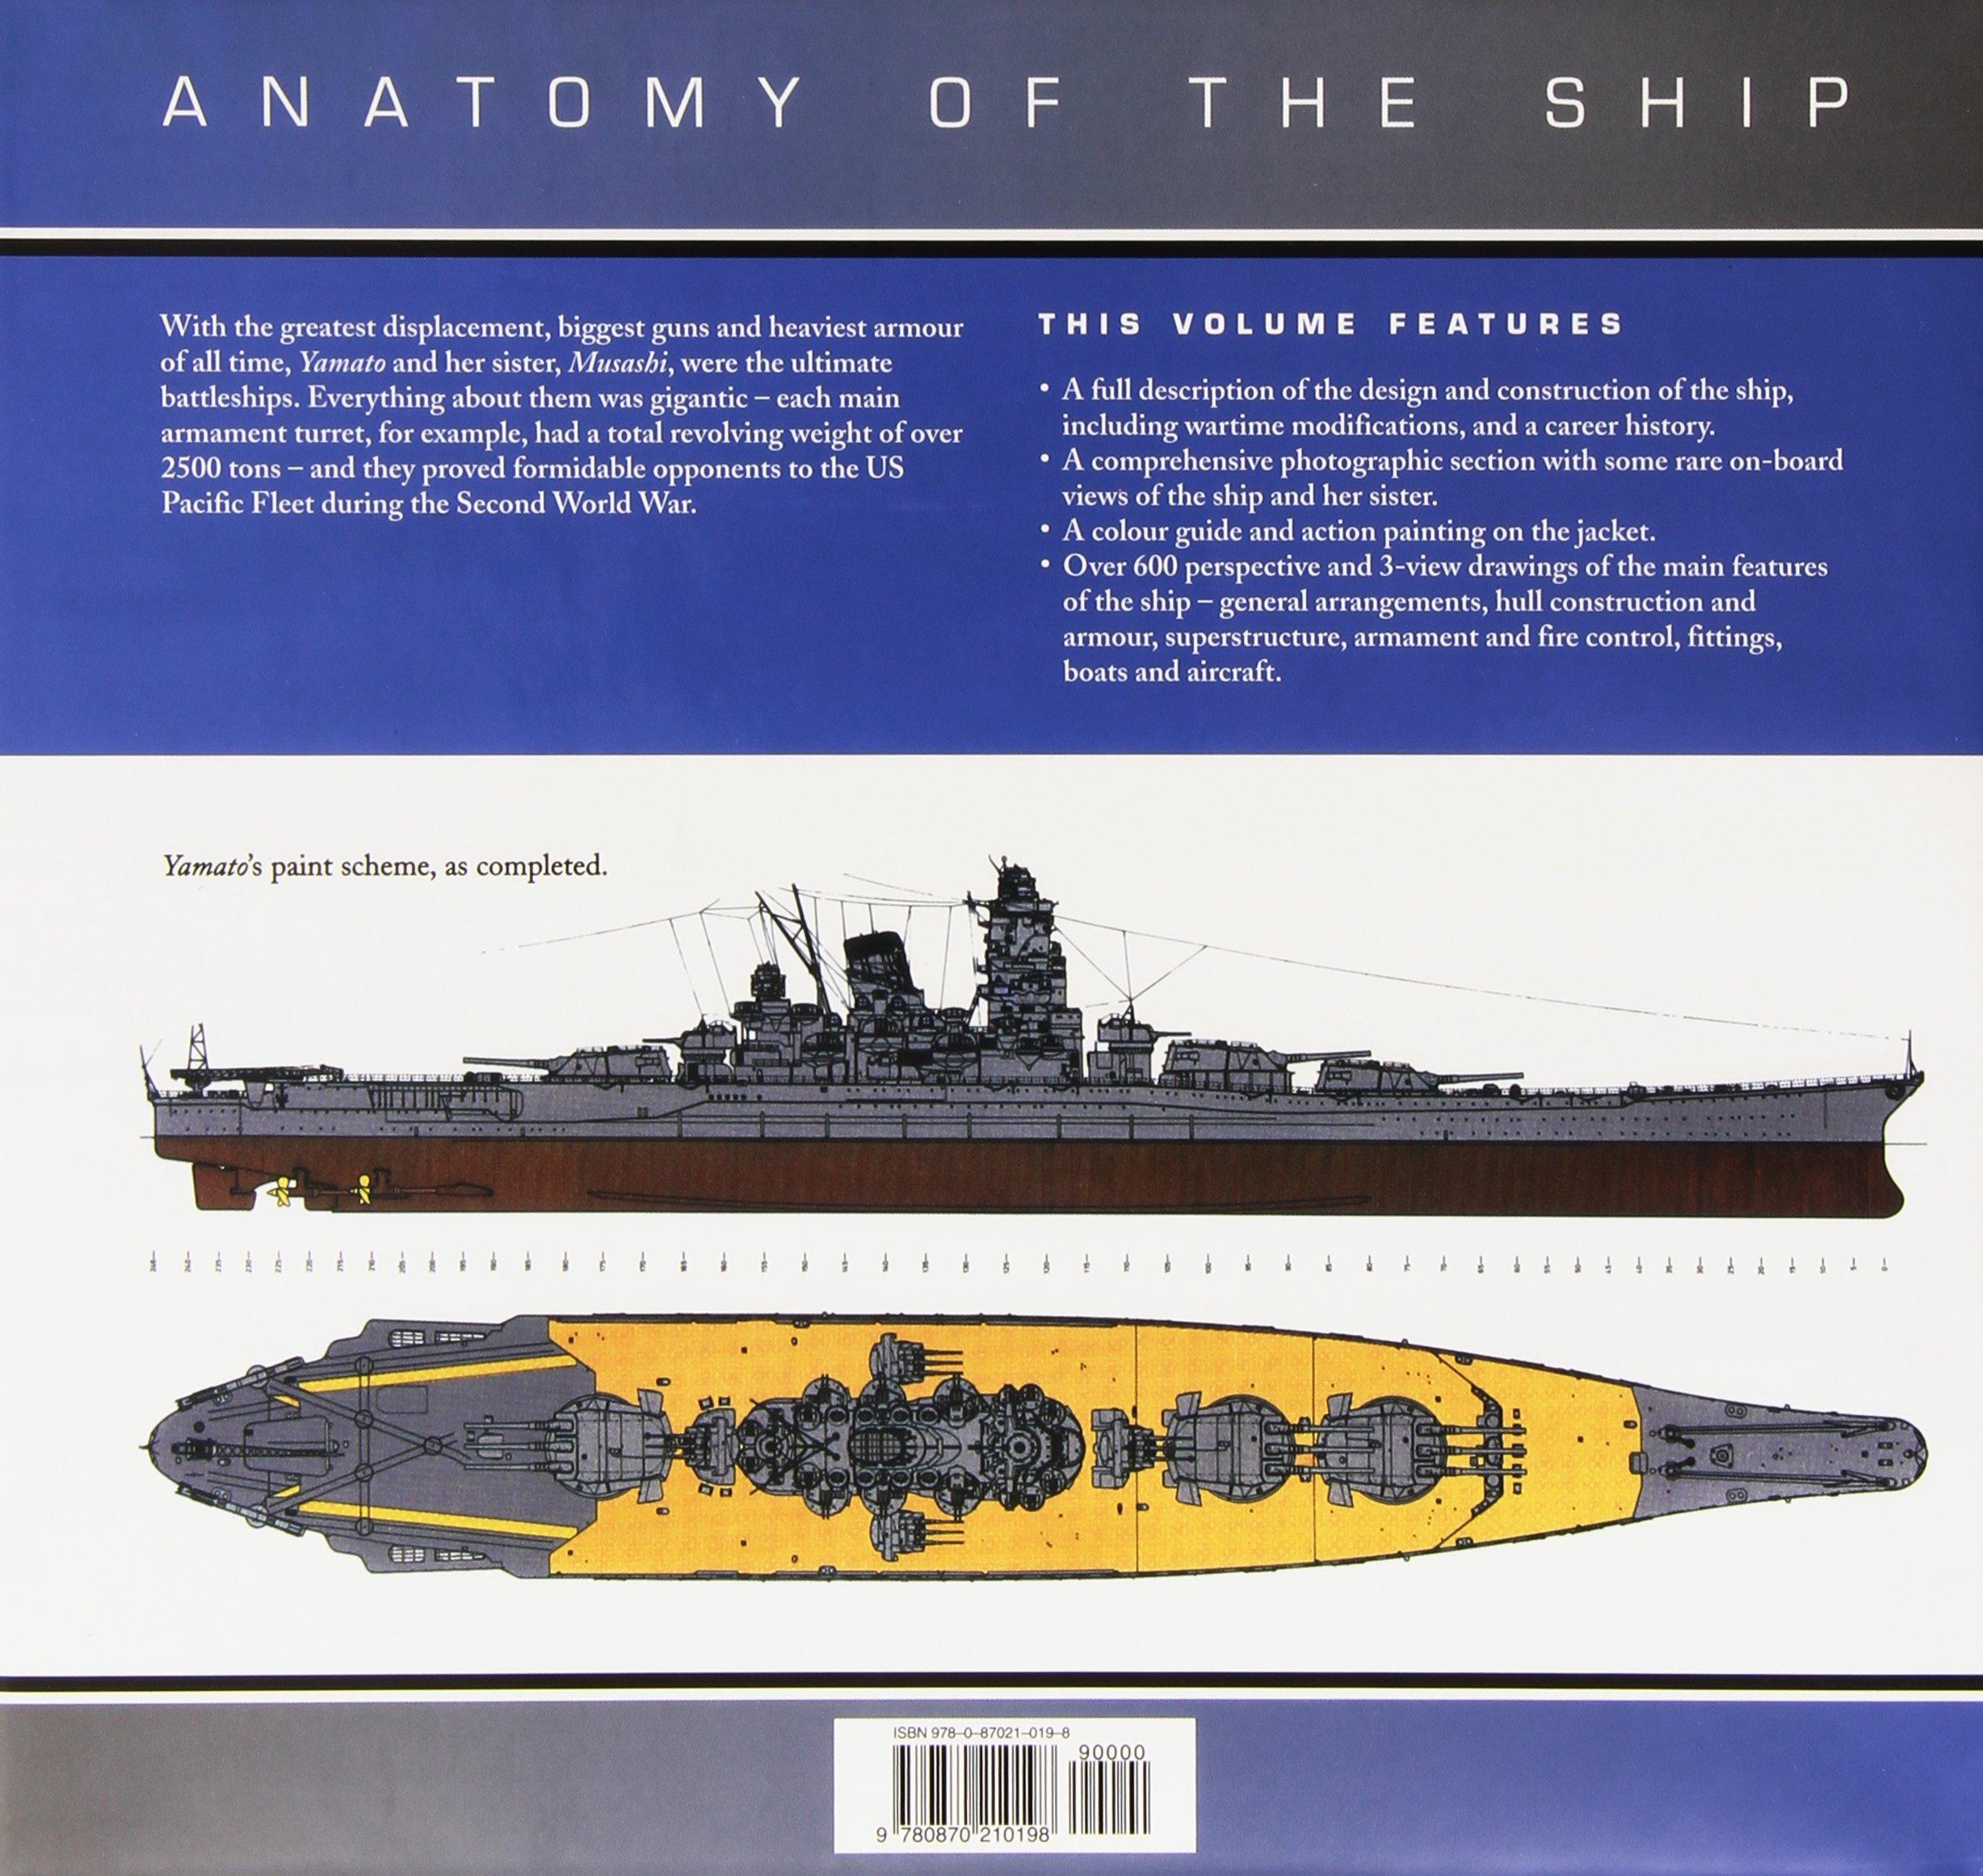 Anatomy Of A Shop The Battleship Yamato Anatomy Of The Ship